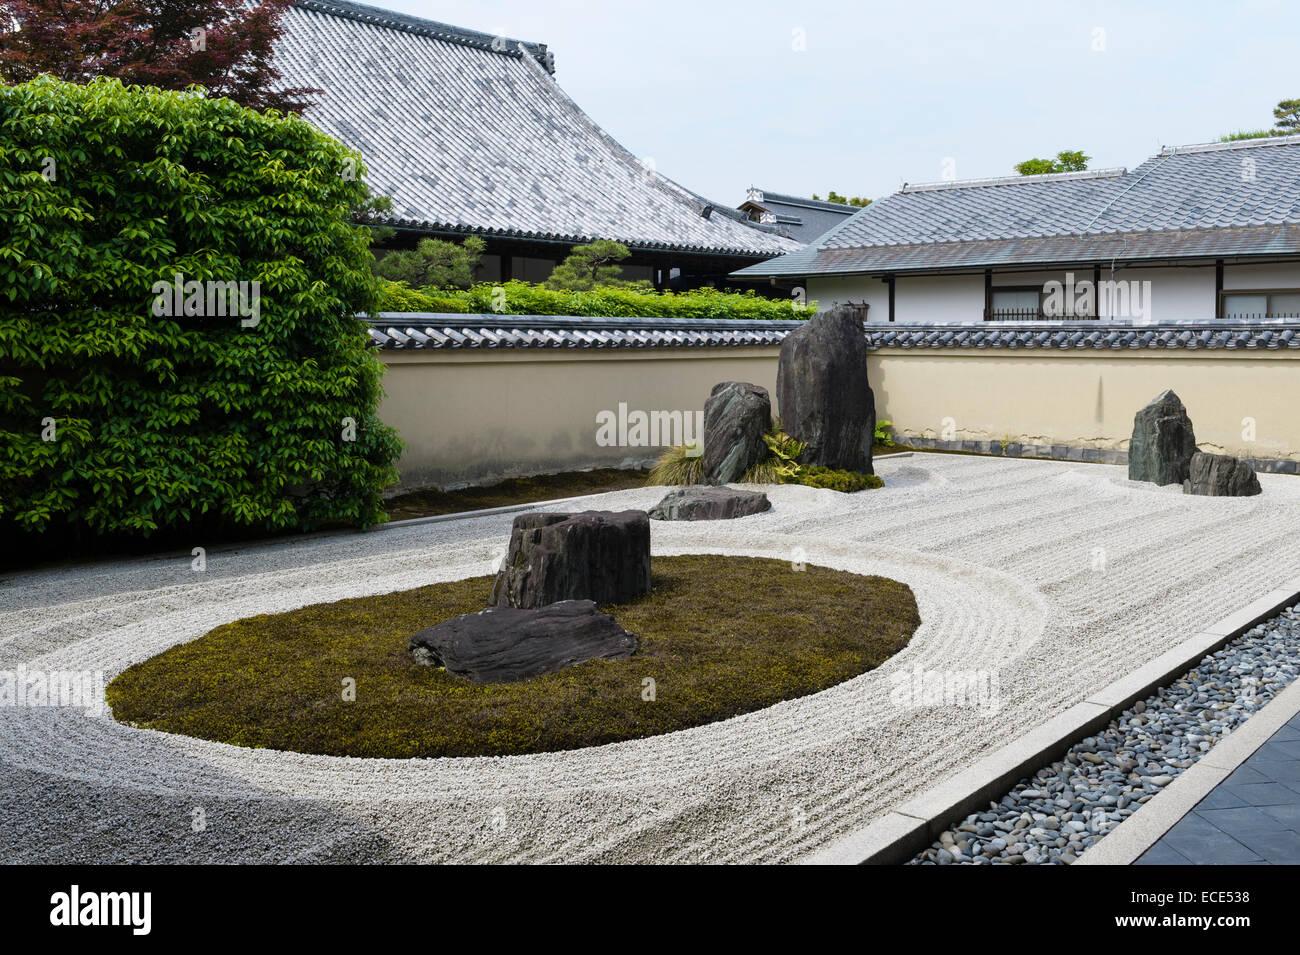 Ryogen-in Temple, Daitoku-ji, Kyoto, Japan. The 'turtle island' in the Isshidan garden - Stock Image